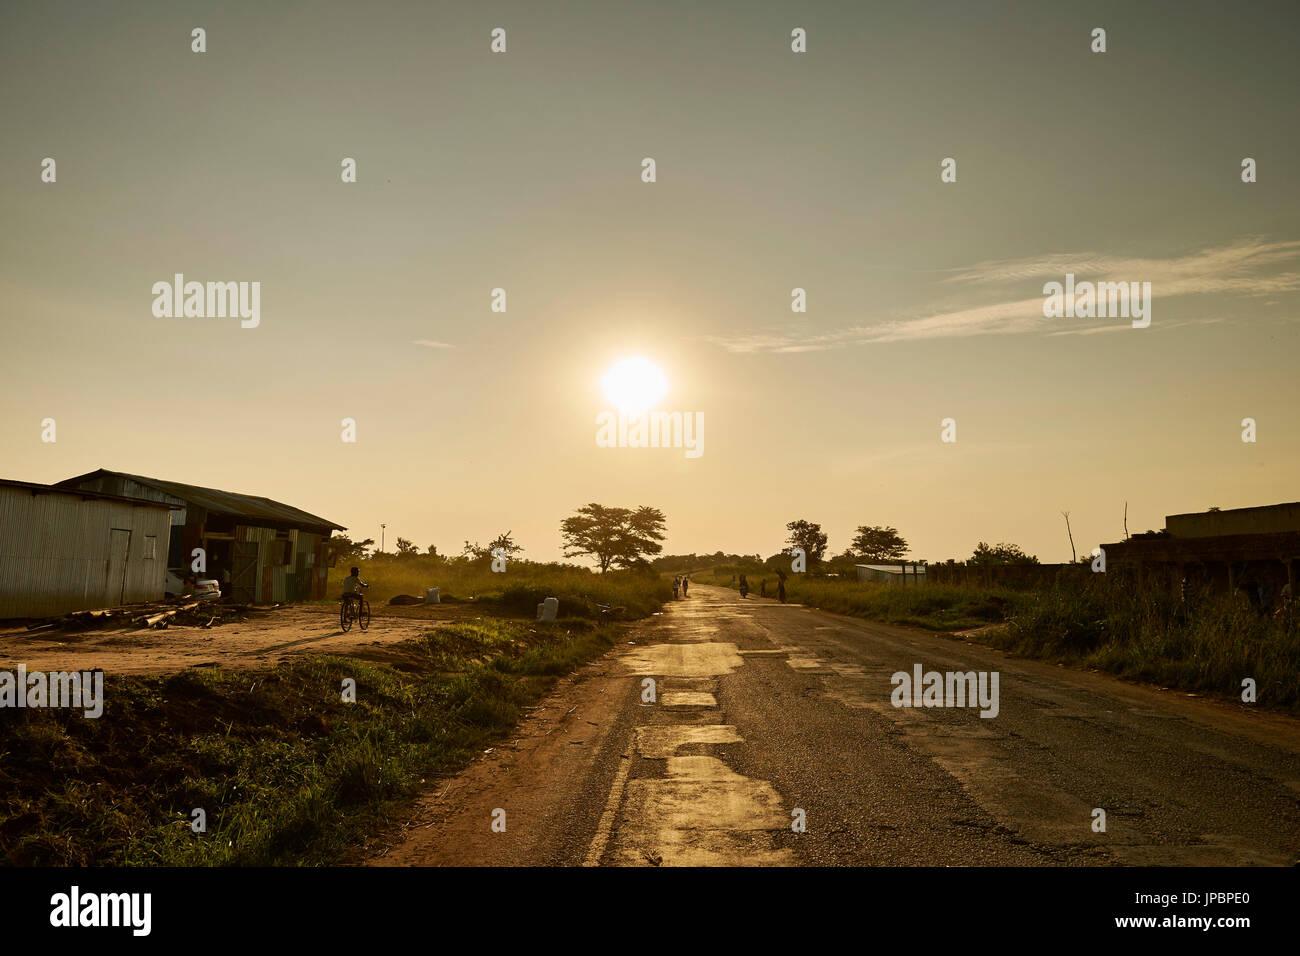 Road in Murchison Falls National Park, Murchison Falls National Park, Masindi District, Western Region of Uganda, Uganda, Eastern Equatorial Africa, Africa - Stock Image